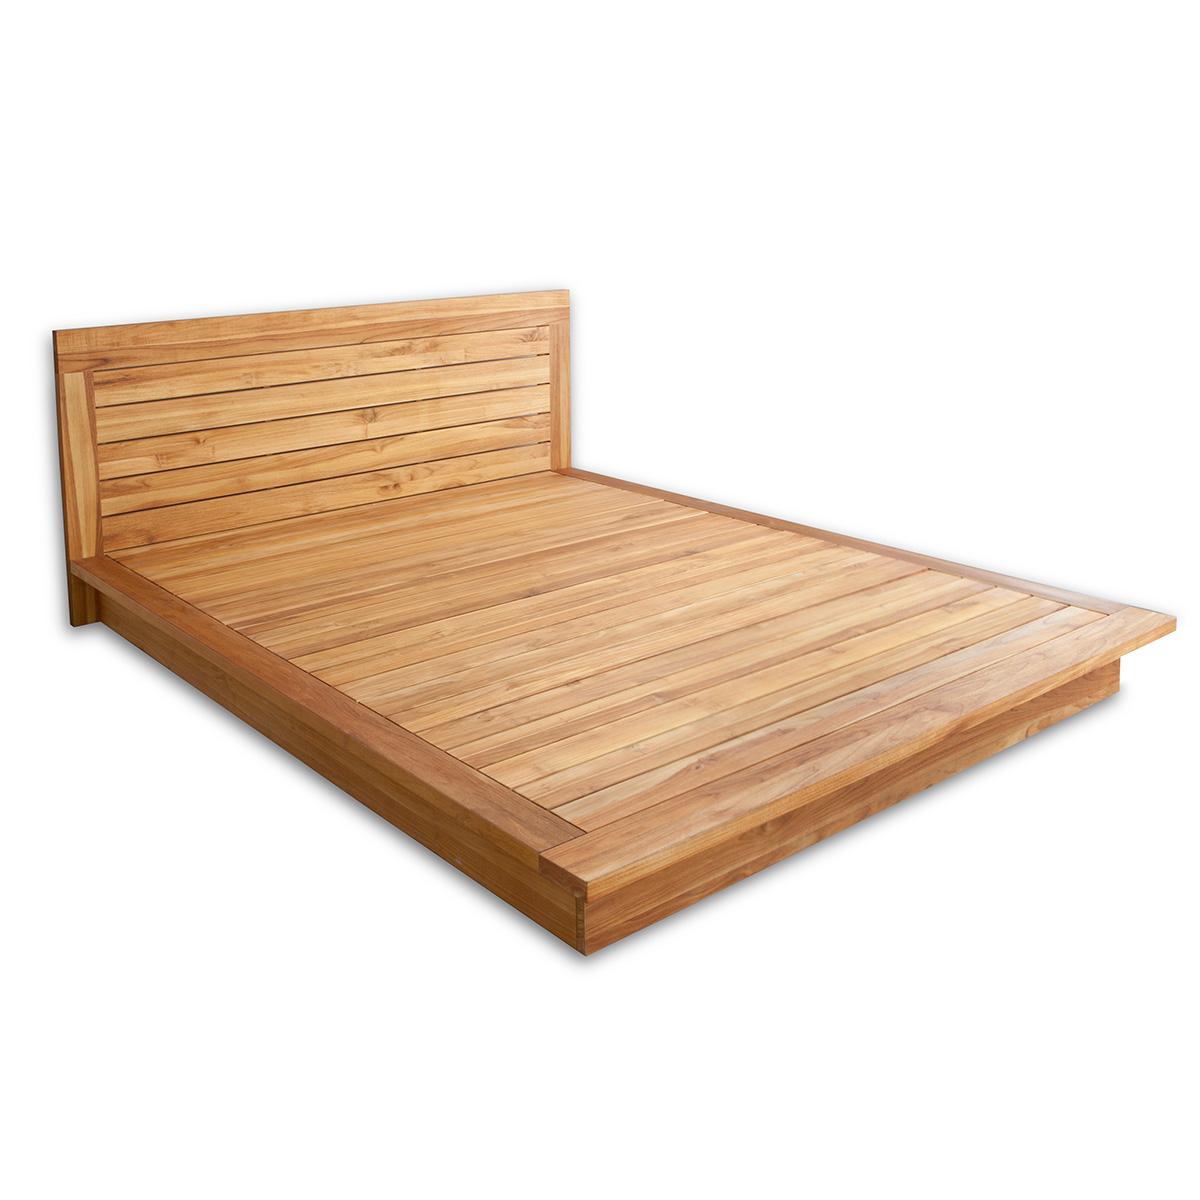 PCH Series Platform Bed